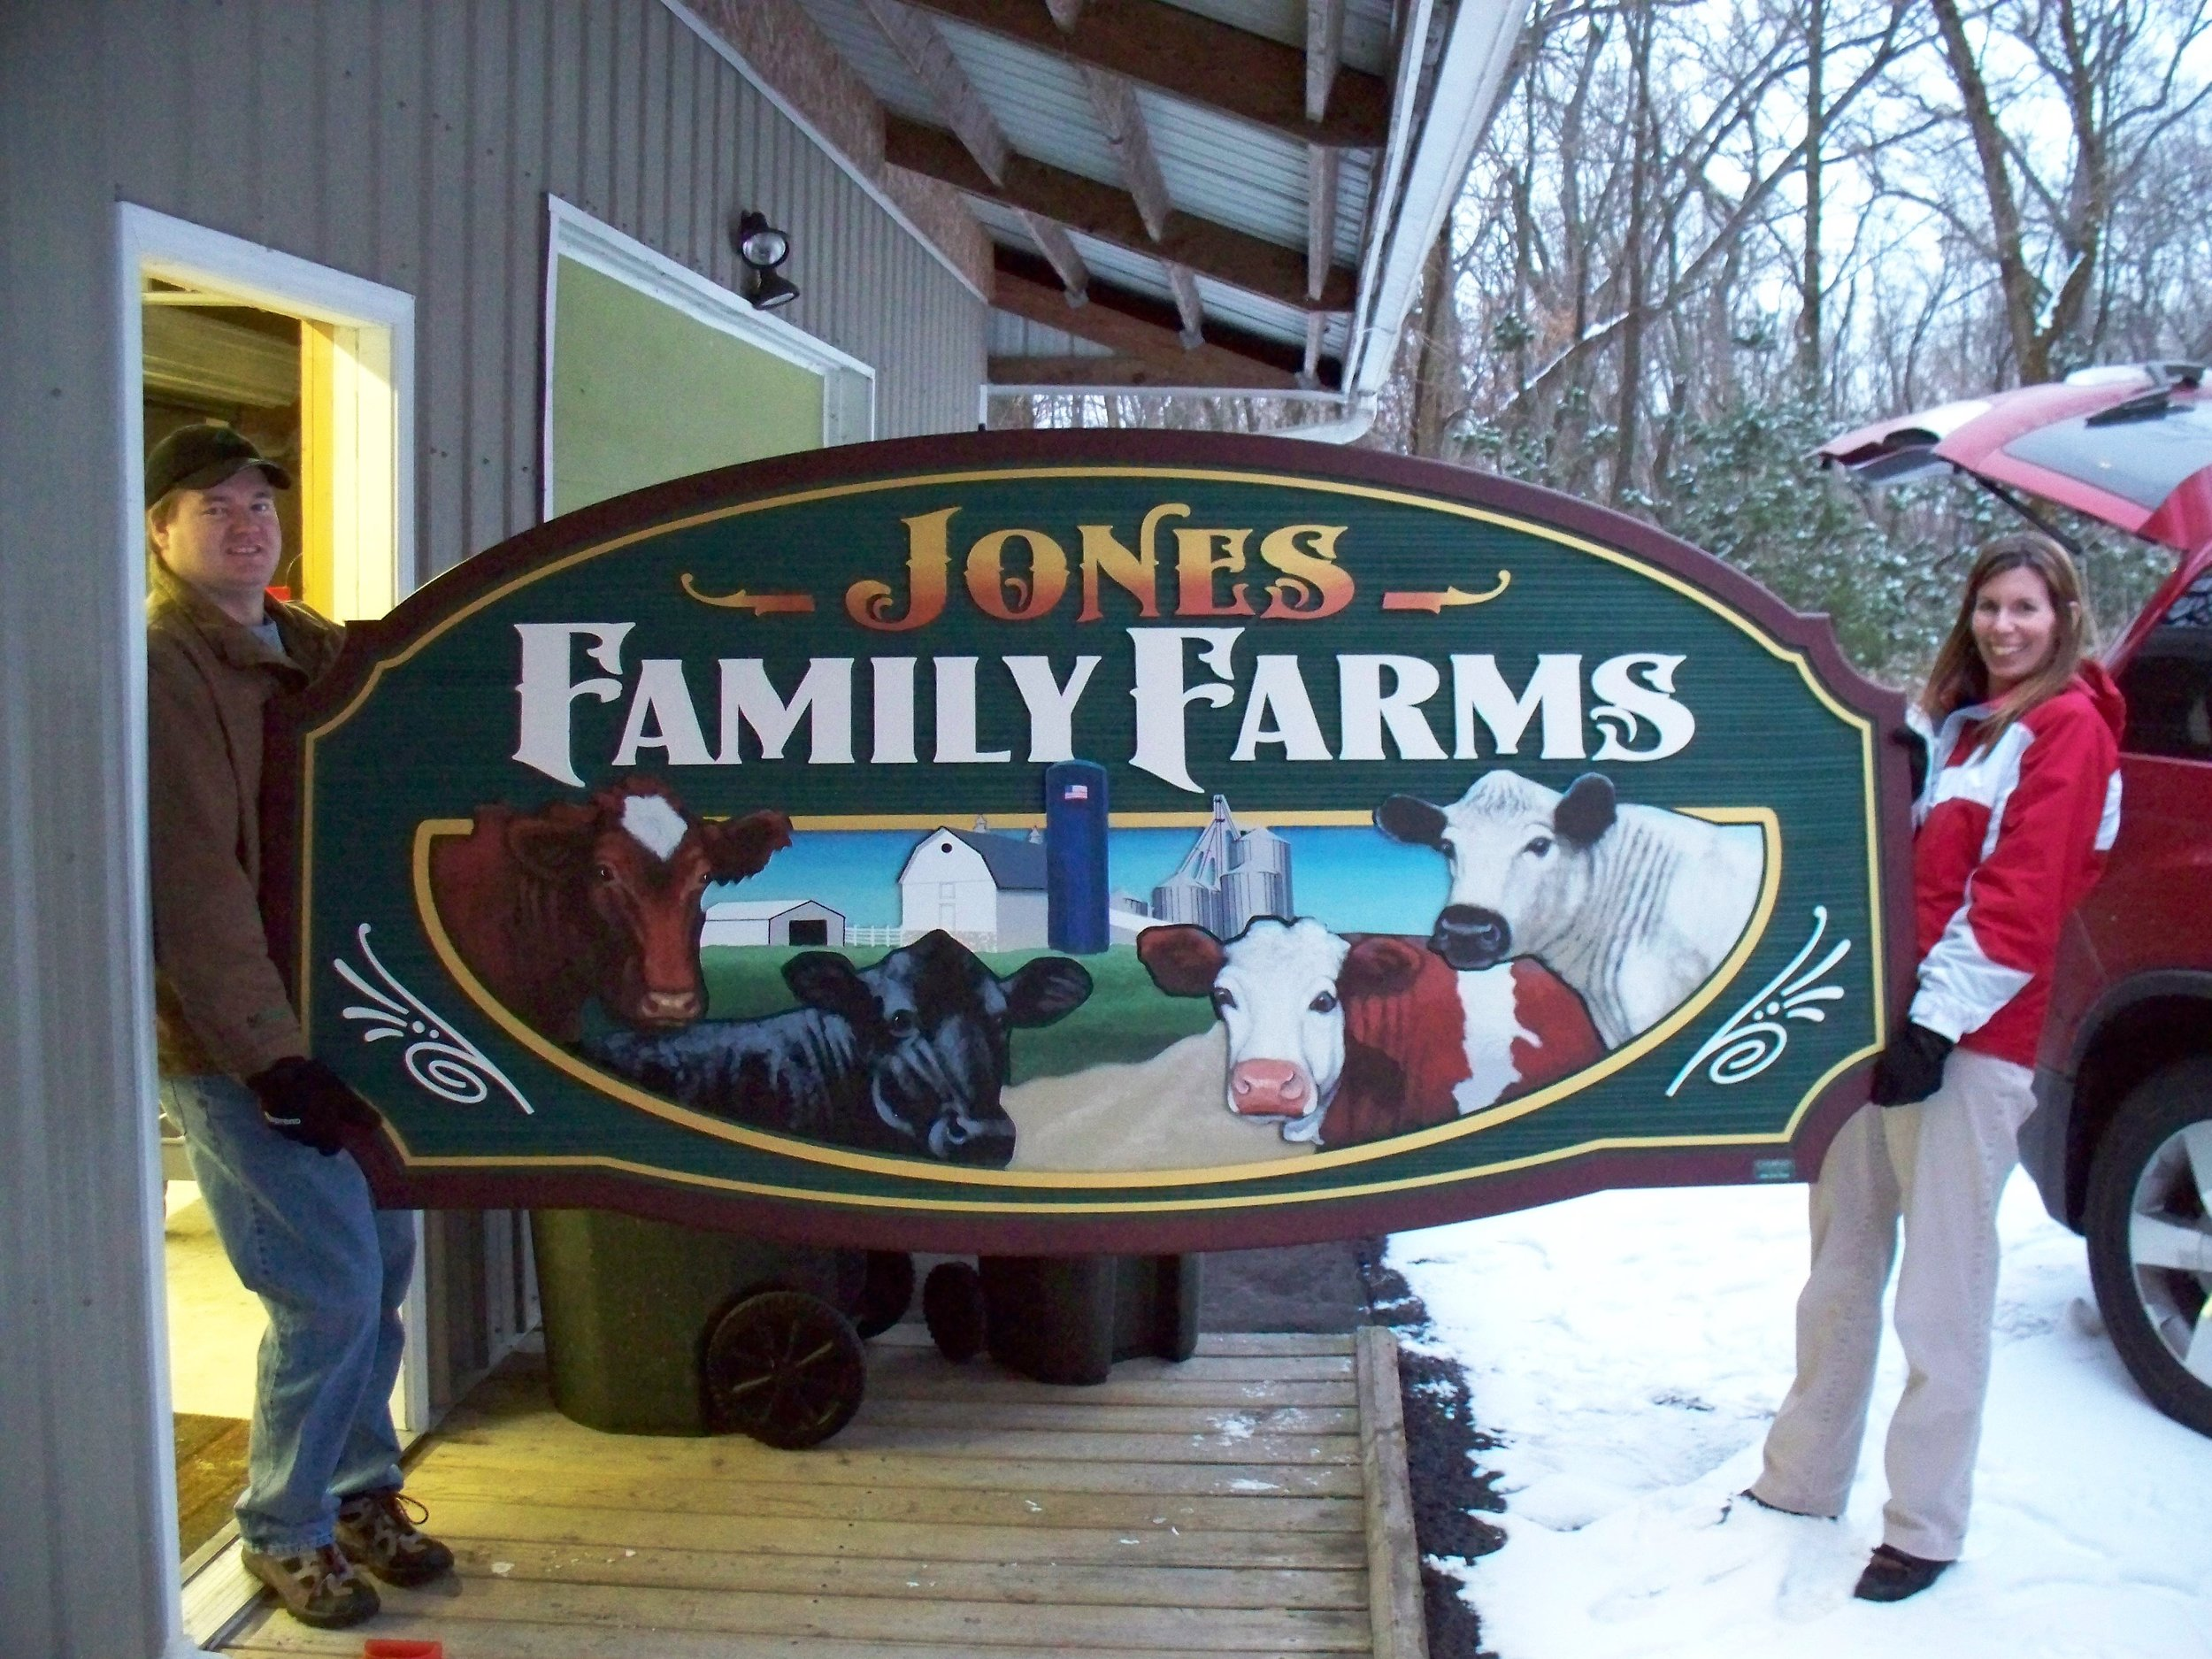 farm_jones.jpg